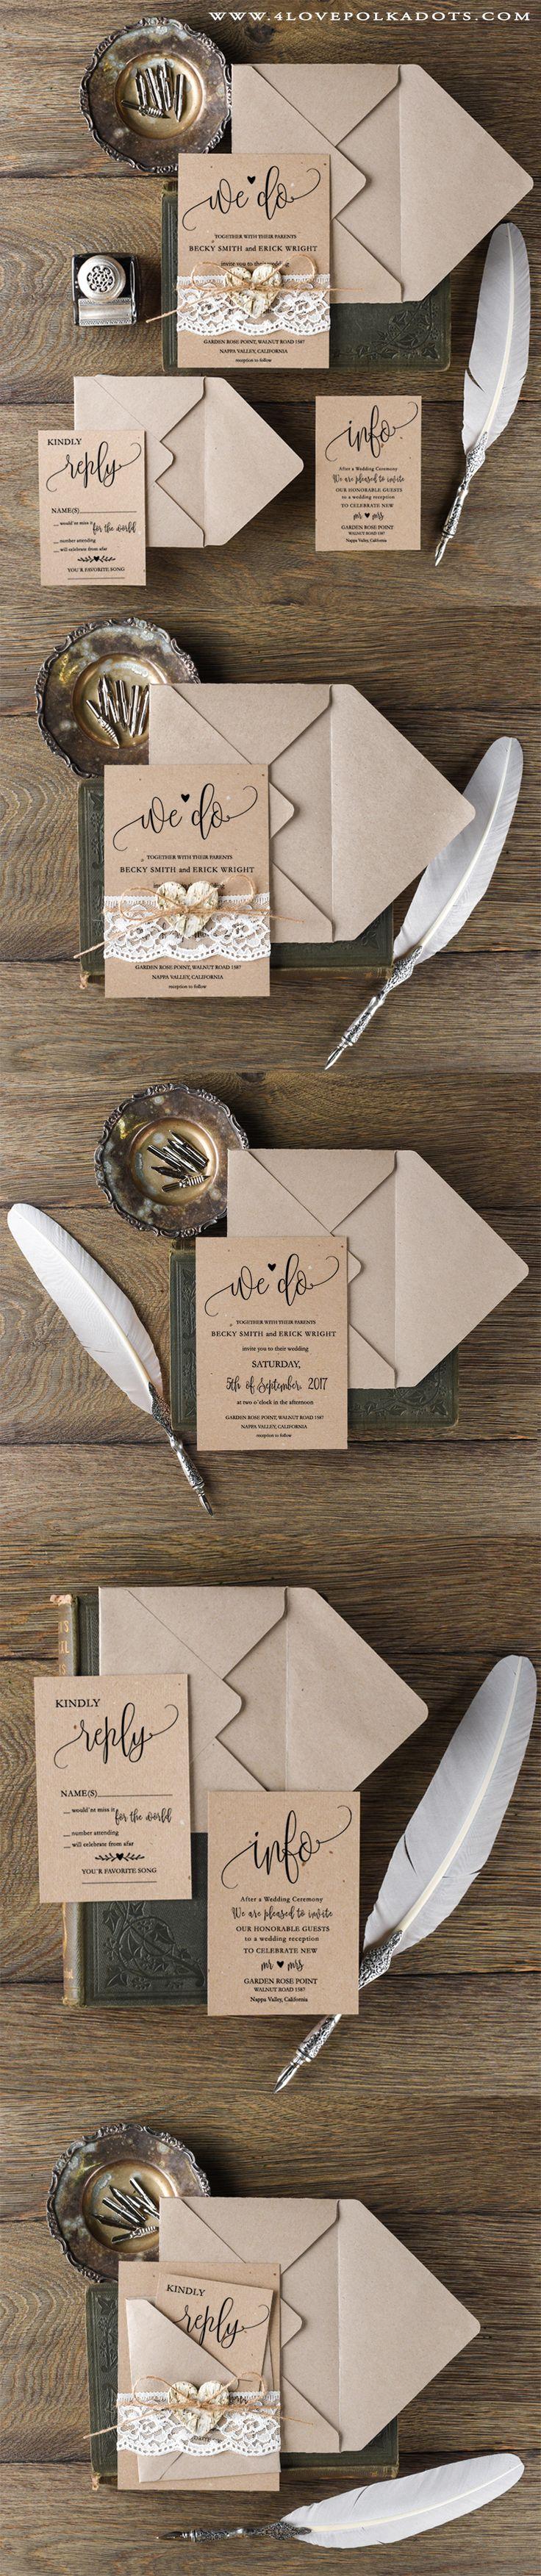 We Do ! Romantic Wedding Invitation Design ! Lace, Twine & Birch Bark Heart…